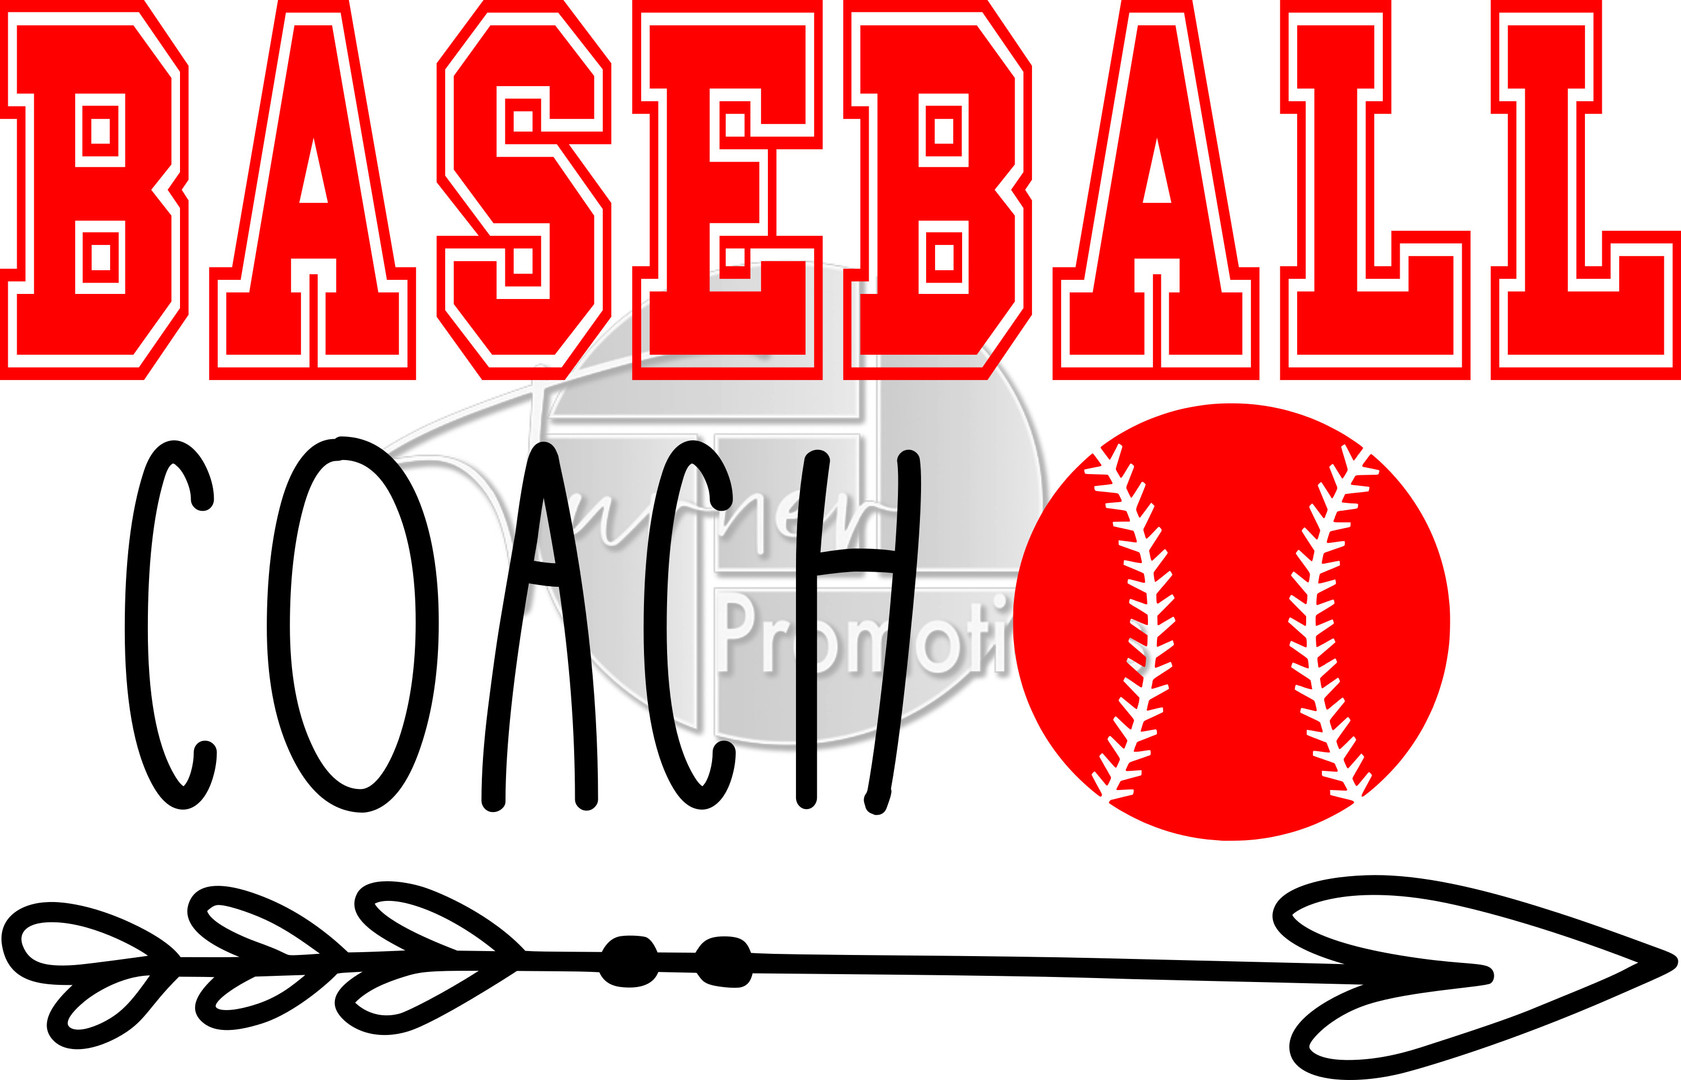 baseballcoach.jpg